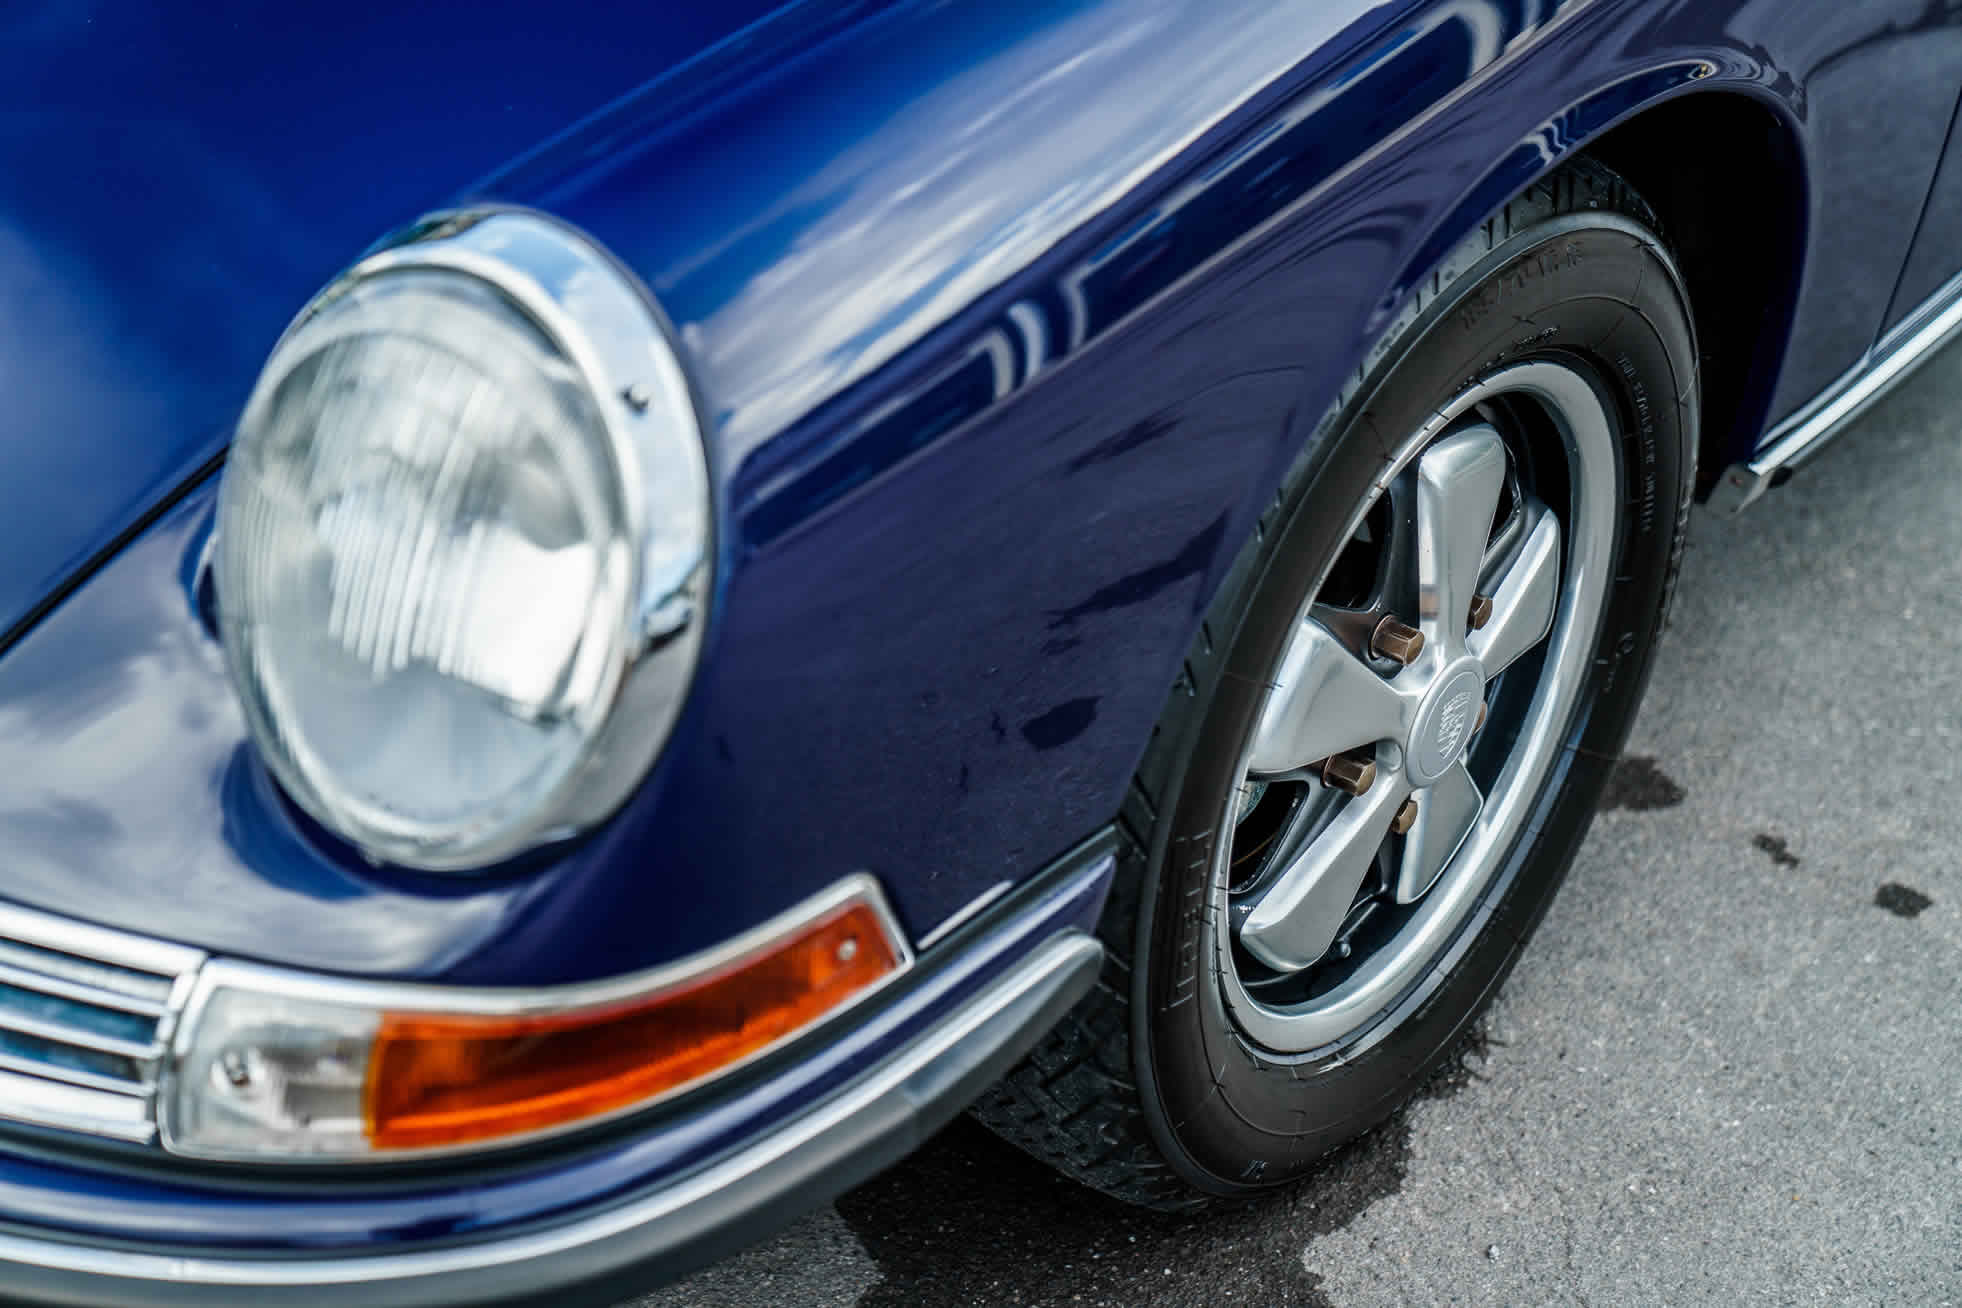 1968 Porsche 911 S For Sale. Sports Purpose Porsche